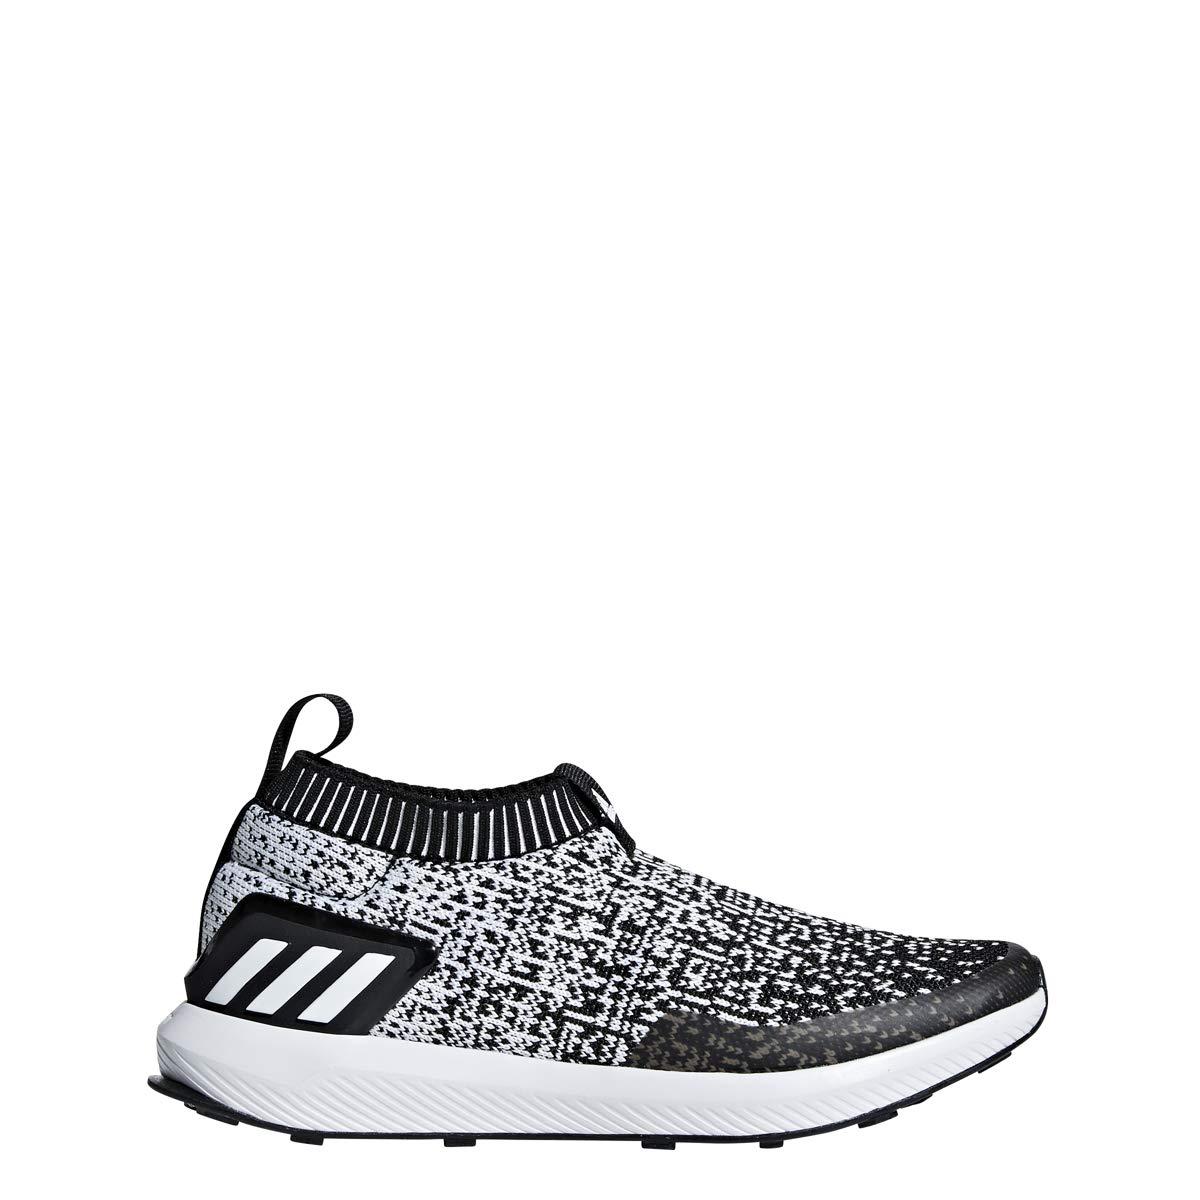 adidas Unisex RapidaRun Laceless Running Shoe White/Black, 5.5 M US Big Kid